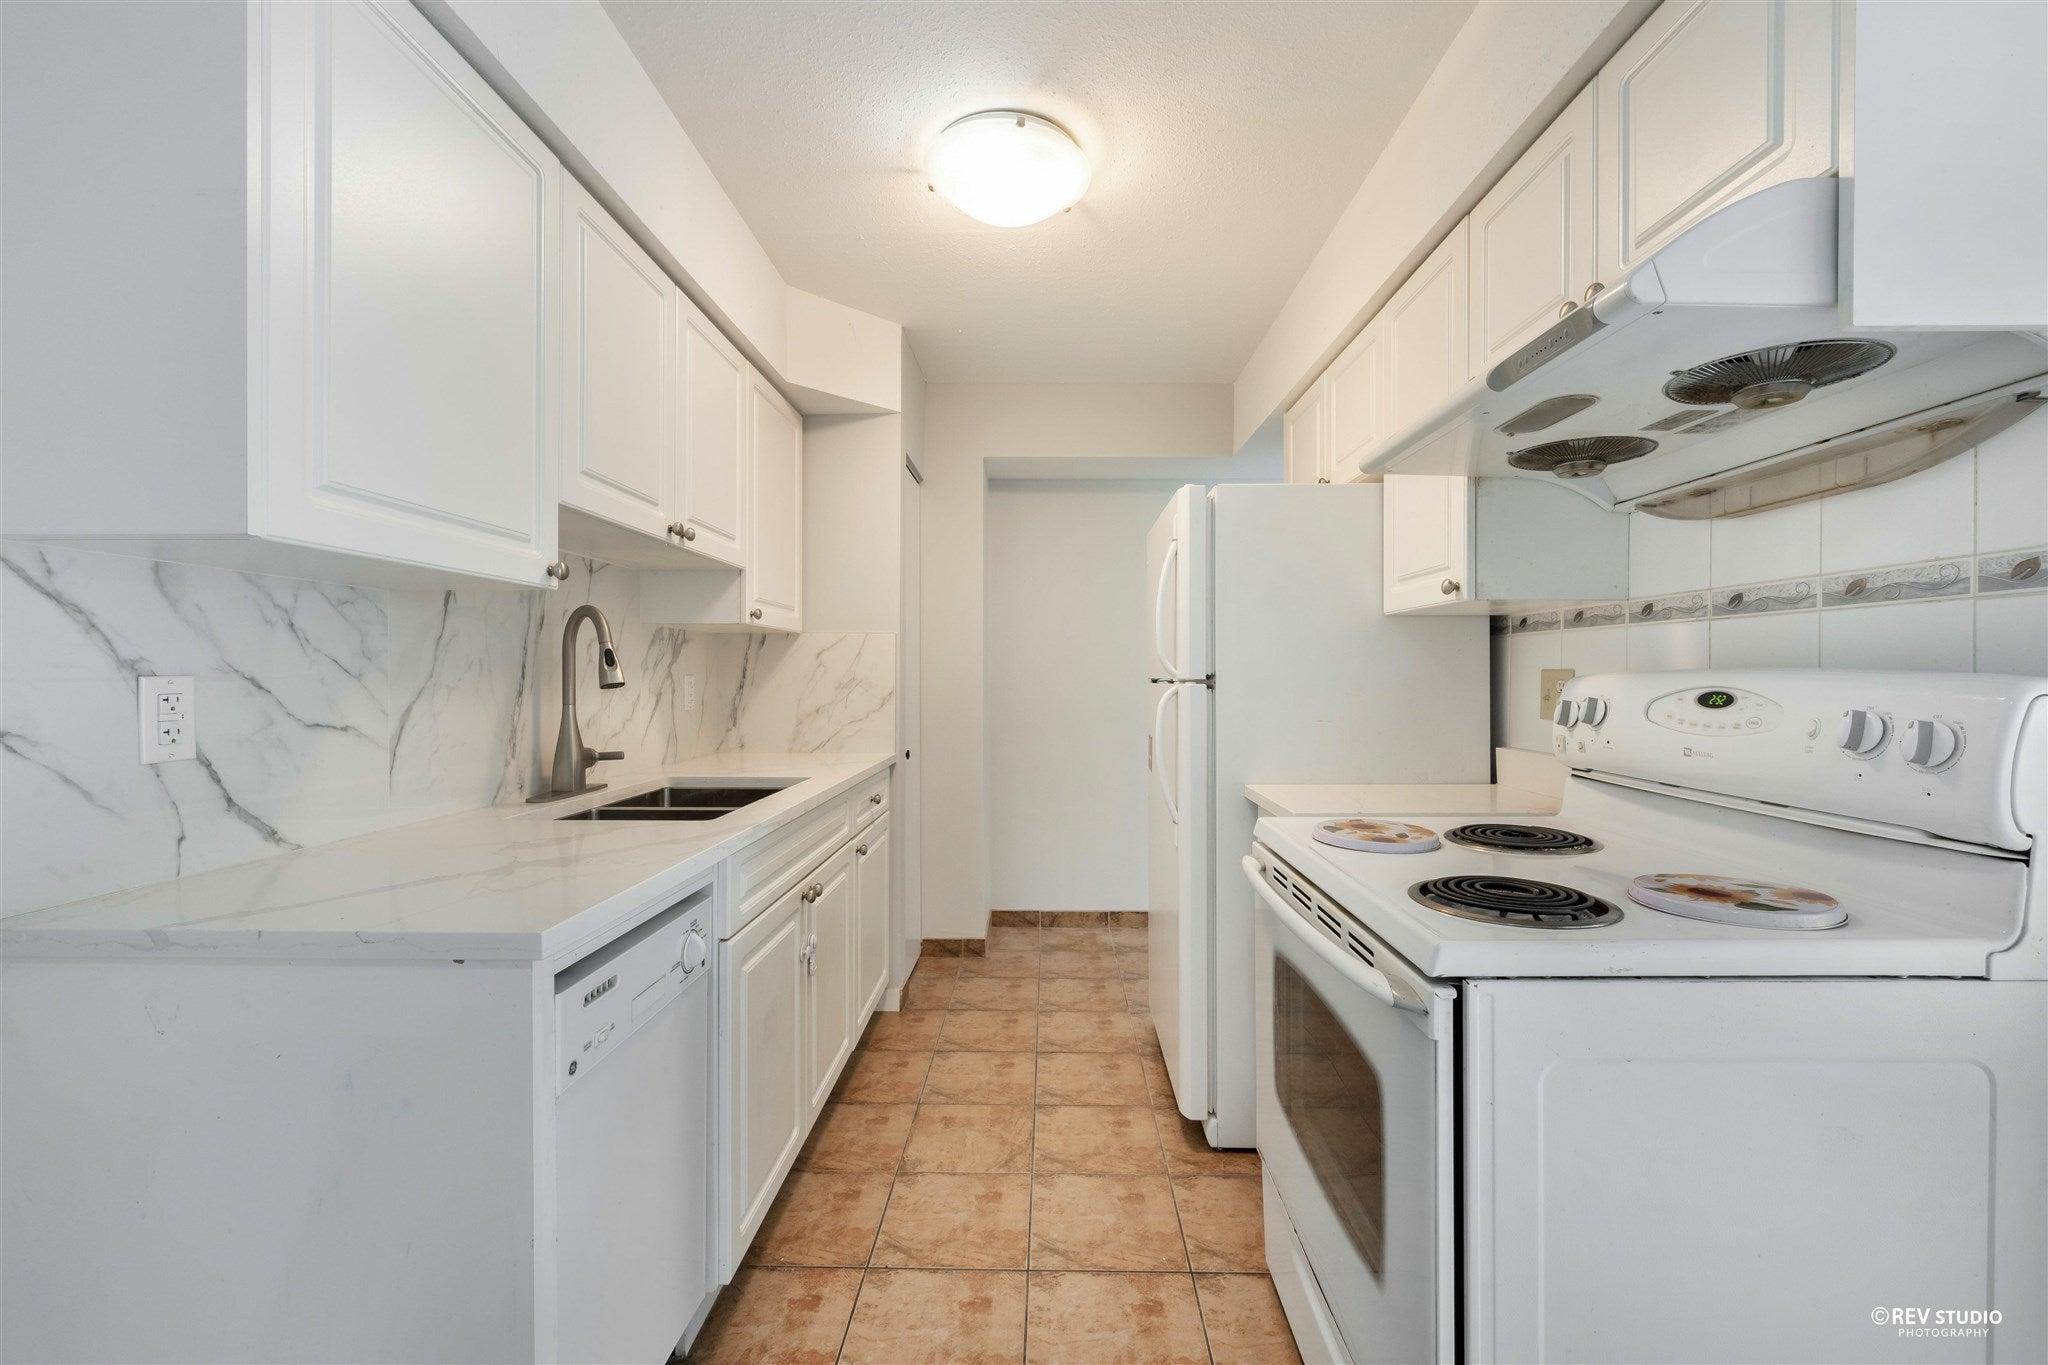 44 3425 E 49TH AVENUE - Killarney VE Townhouse for sale, 3 Bedrooms (R2594254) - #1